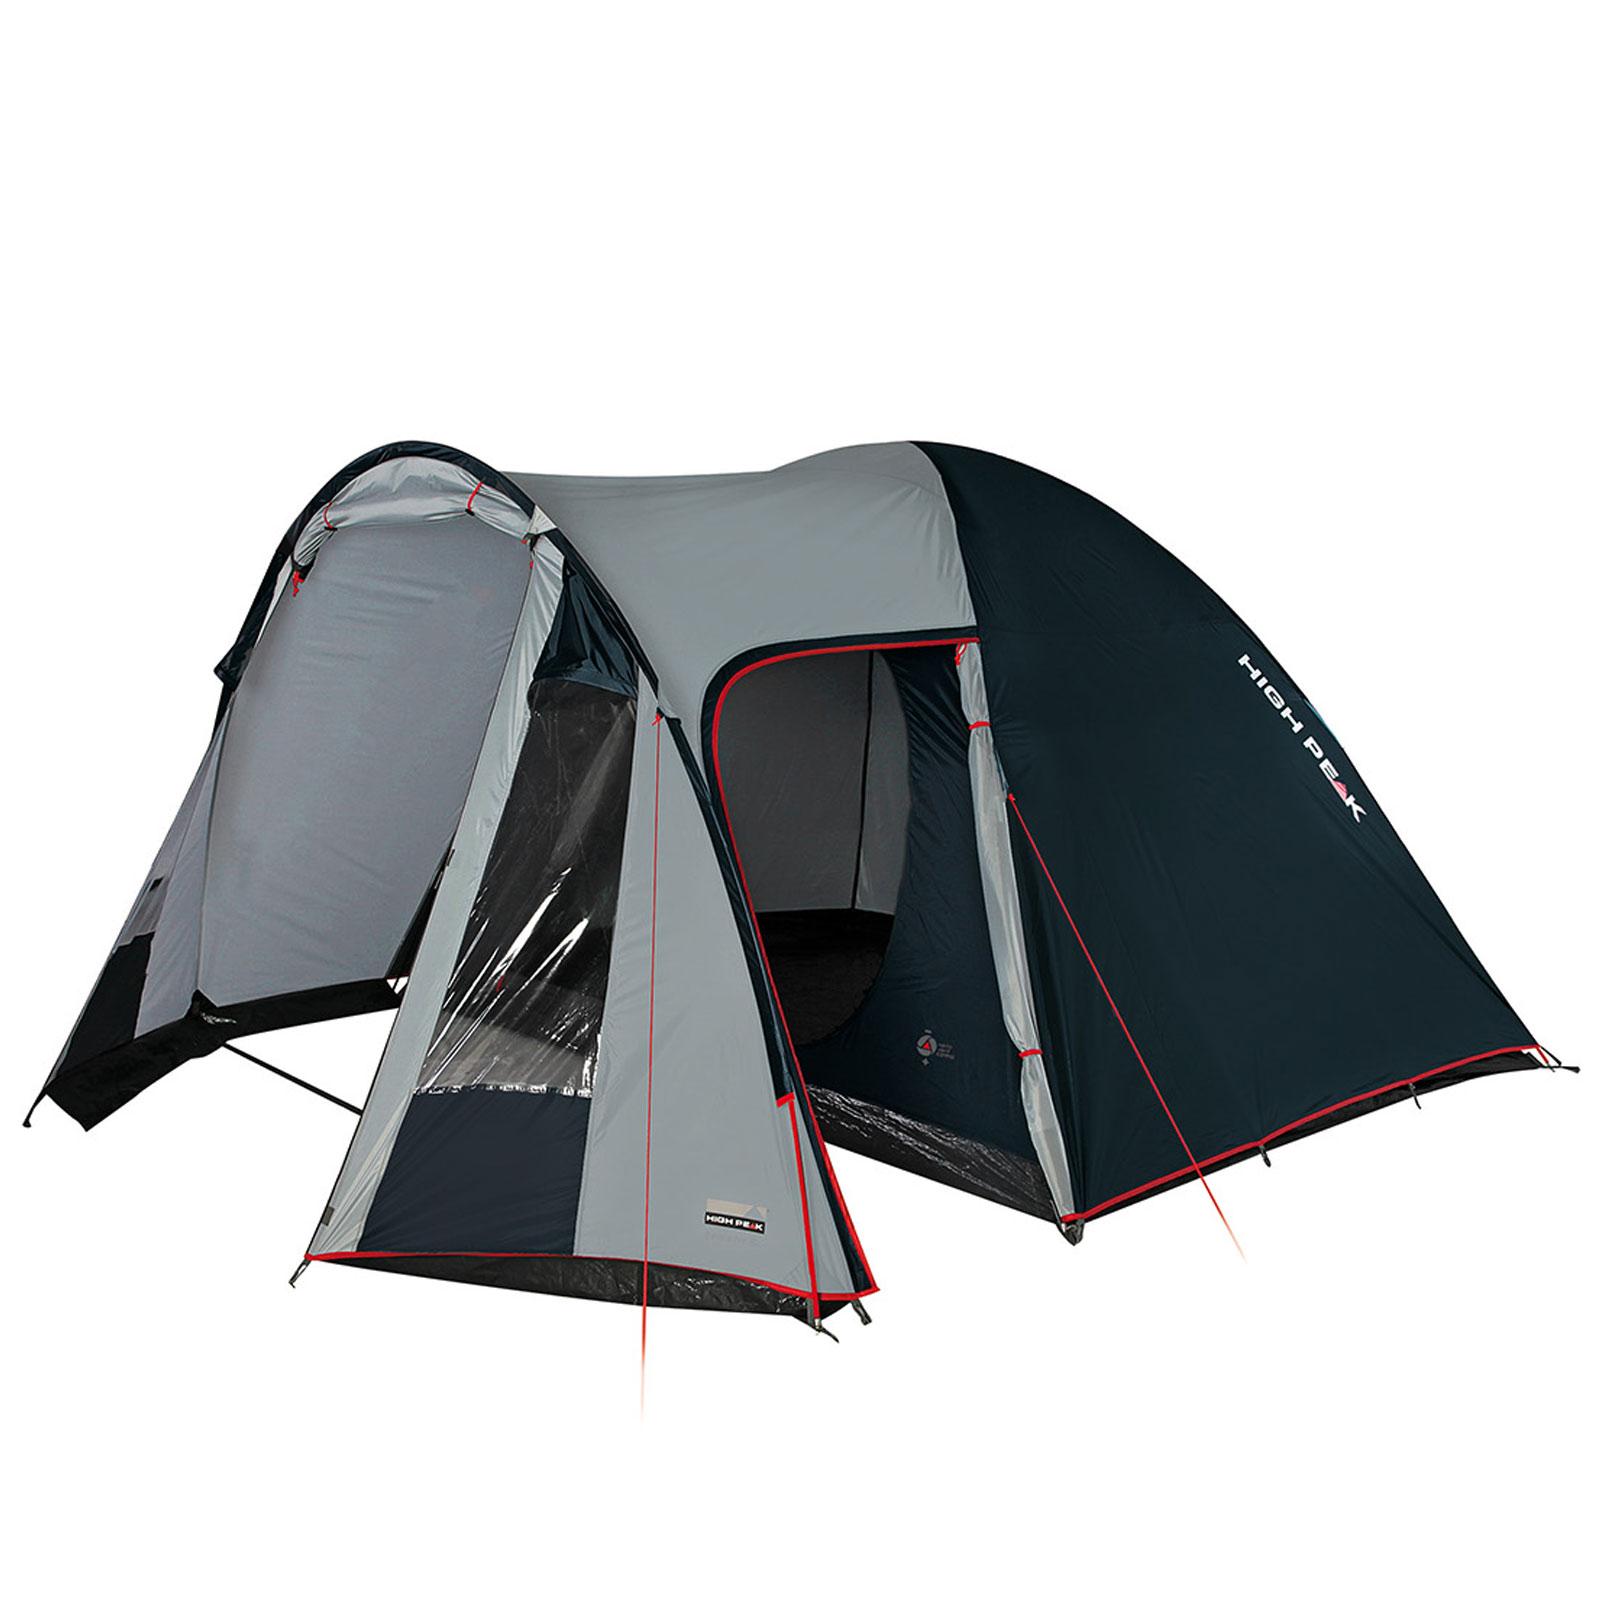 Zelt Ancona 5 : High peak zelt ancona mann camping familienzelt